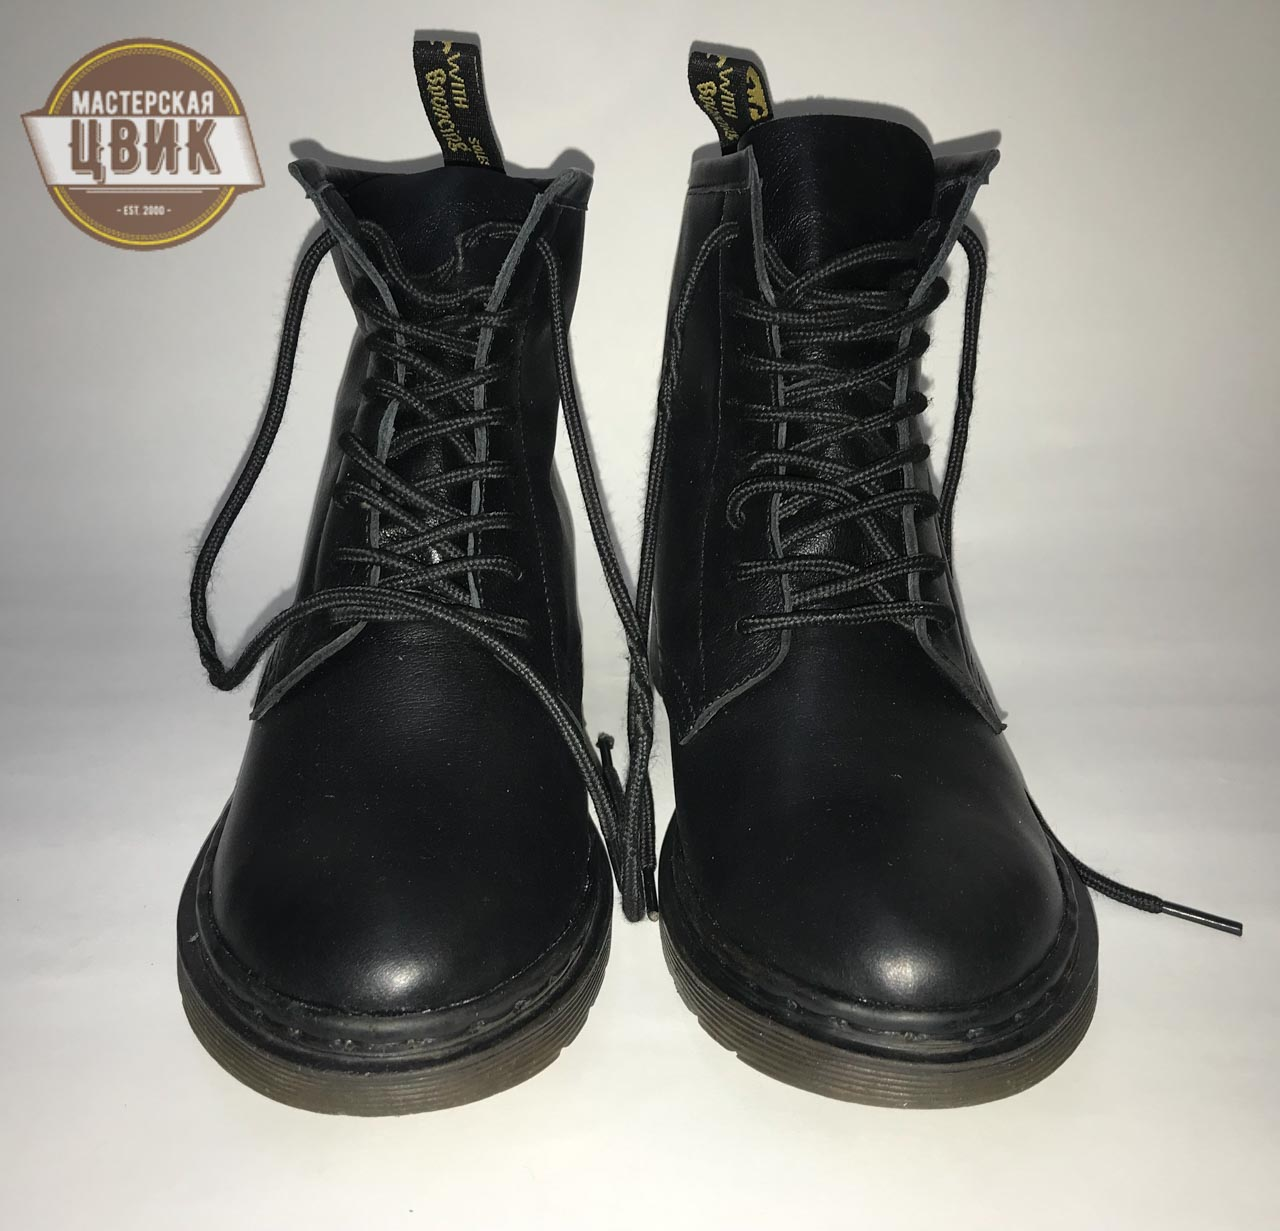 individualnyj-poshiv-obuvi-minsk-61 Индивидуальный пошив обуви